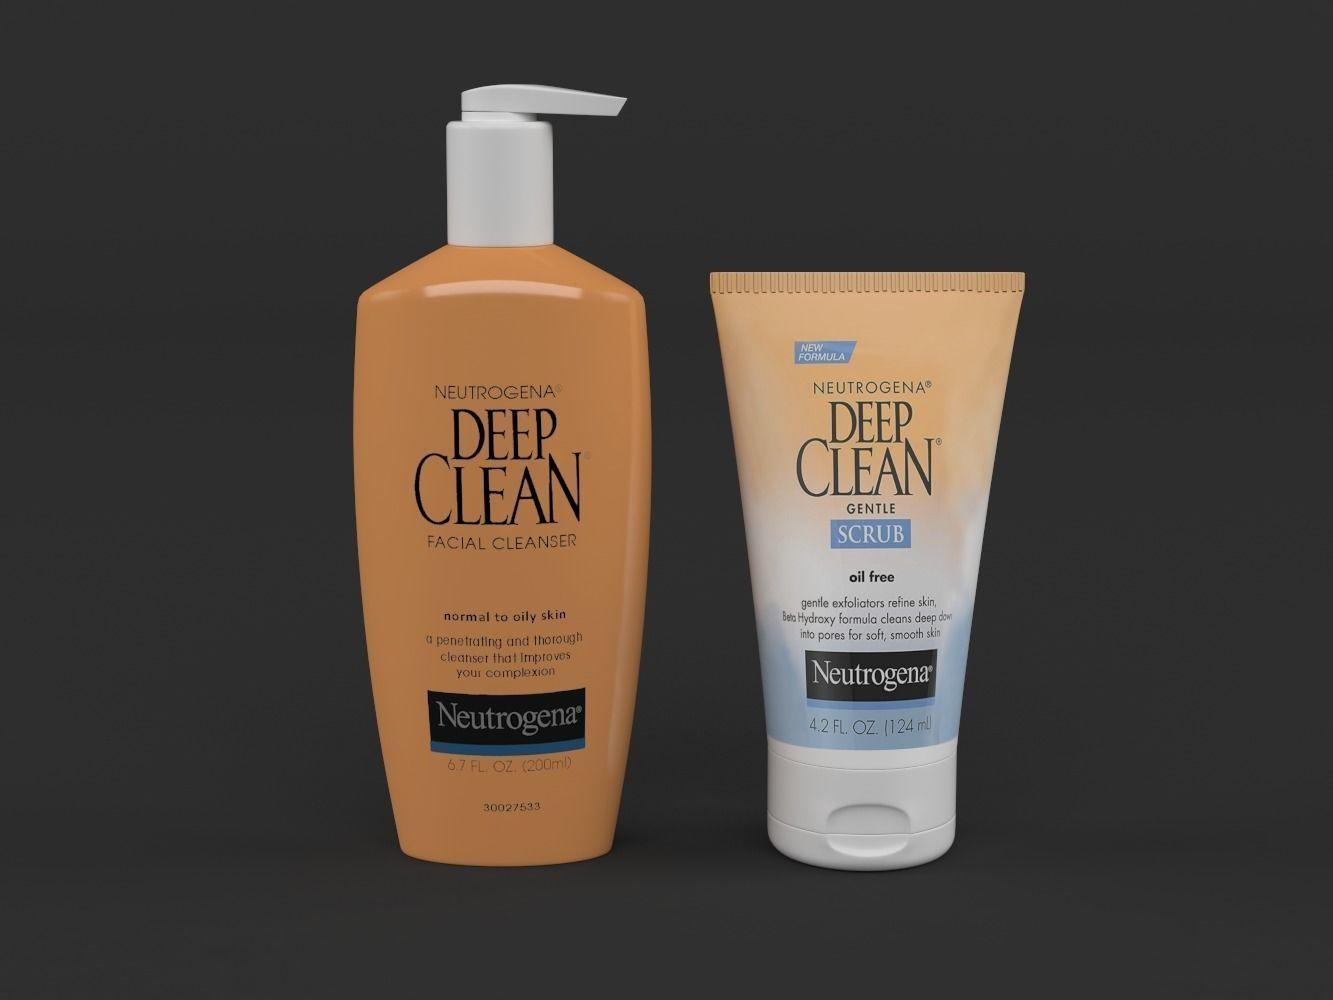 Neutrogena Deep Clean Daily Facial Cleanser